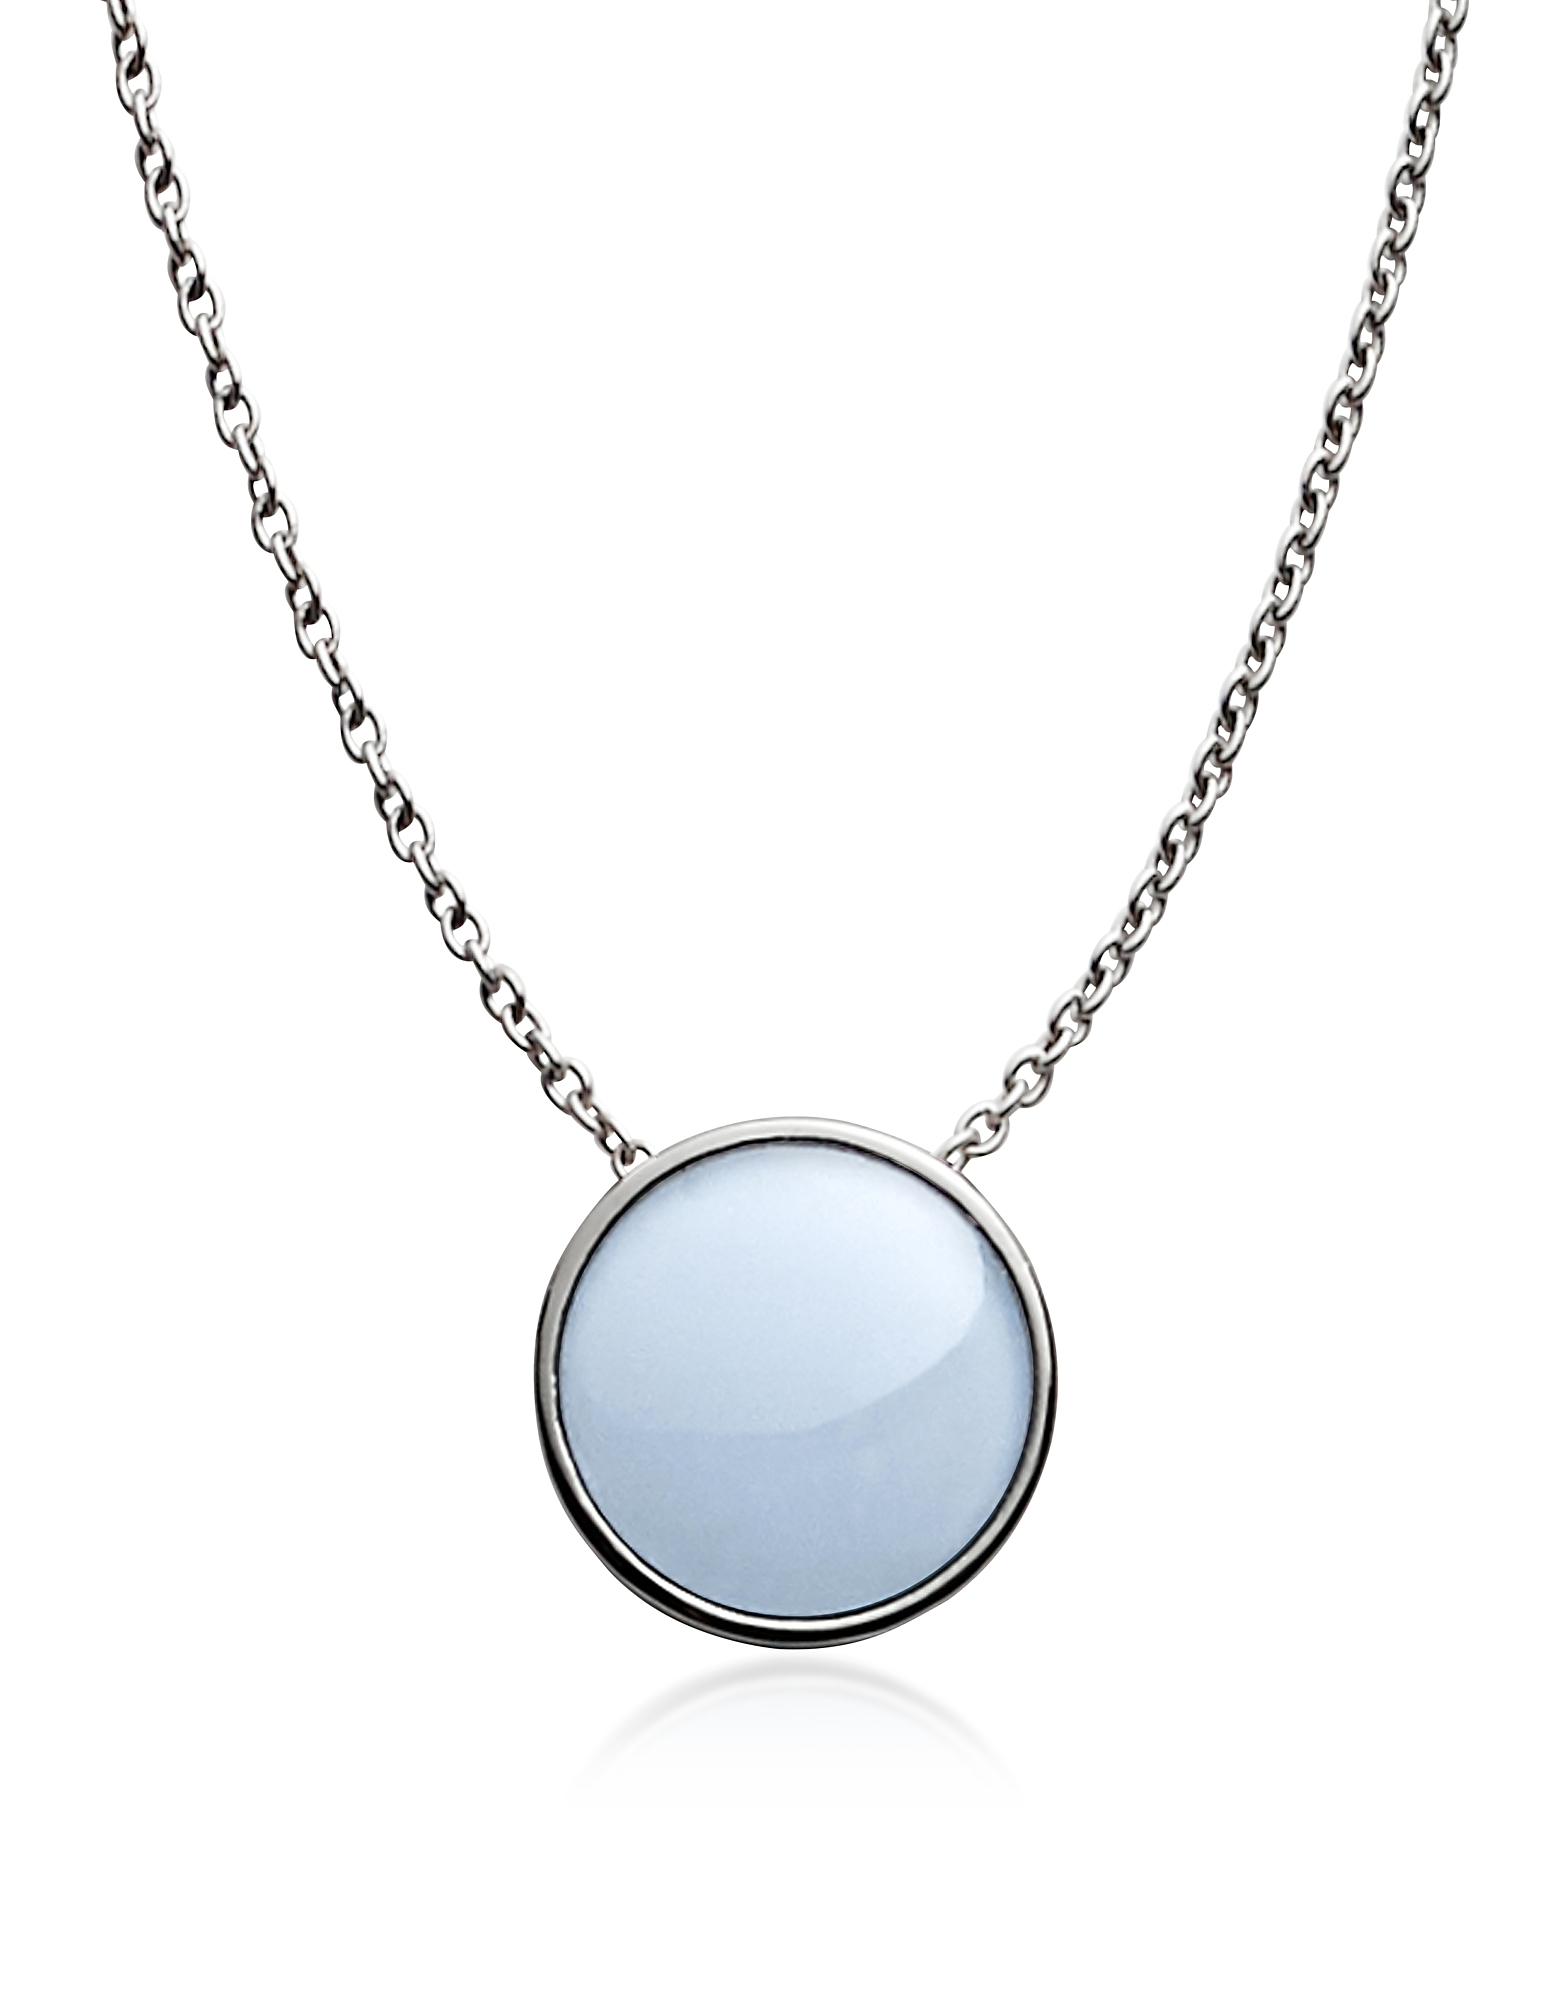 Skagen Necklaces, Sea glass Silver Tone Pendant Necklace